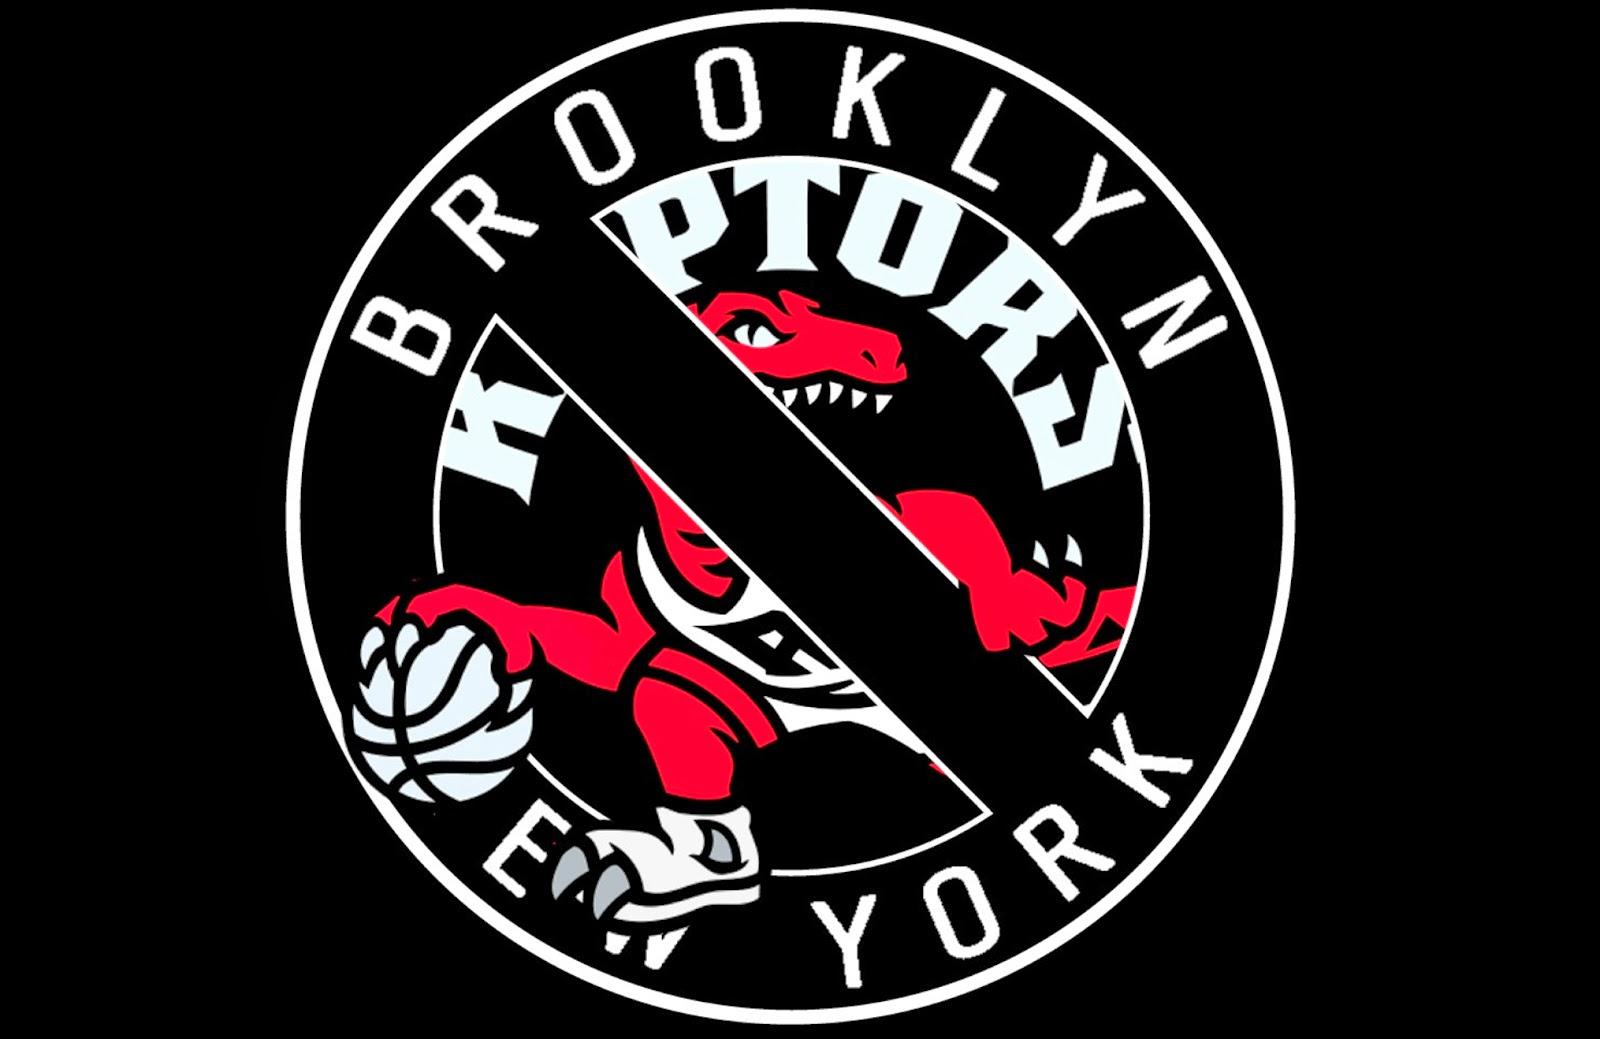 Nets Vs Raptors: My GraphiCKs: Nets Vs Raptors